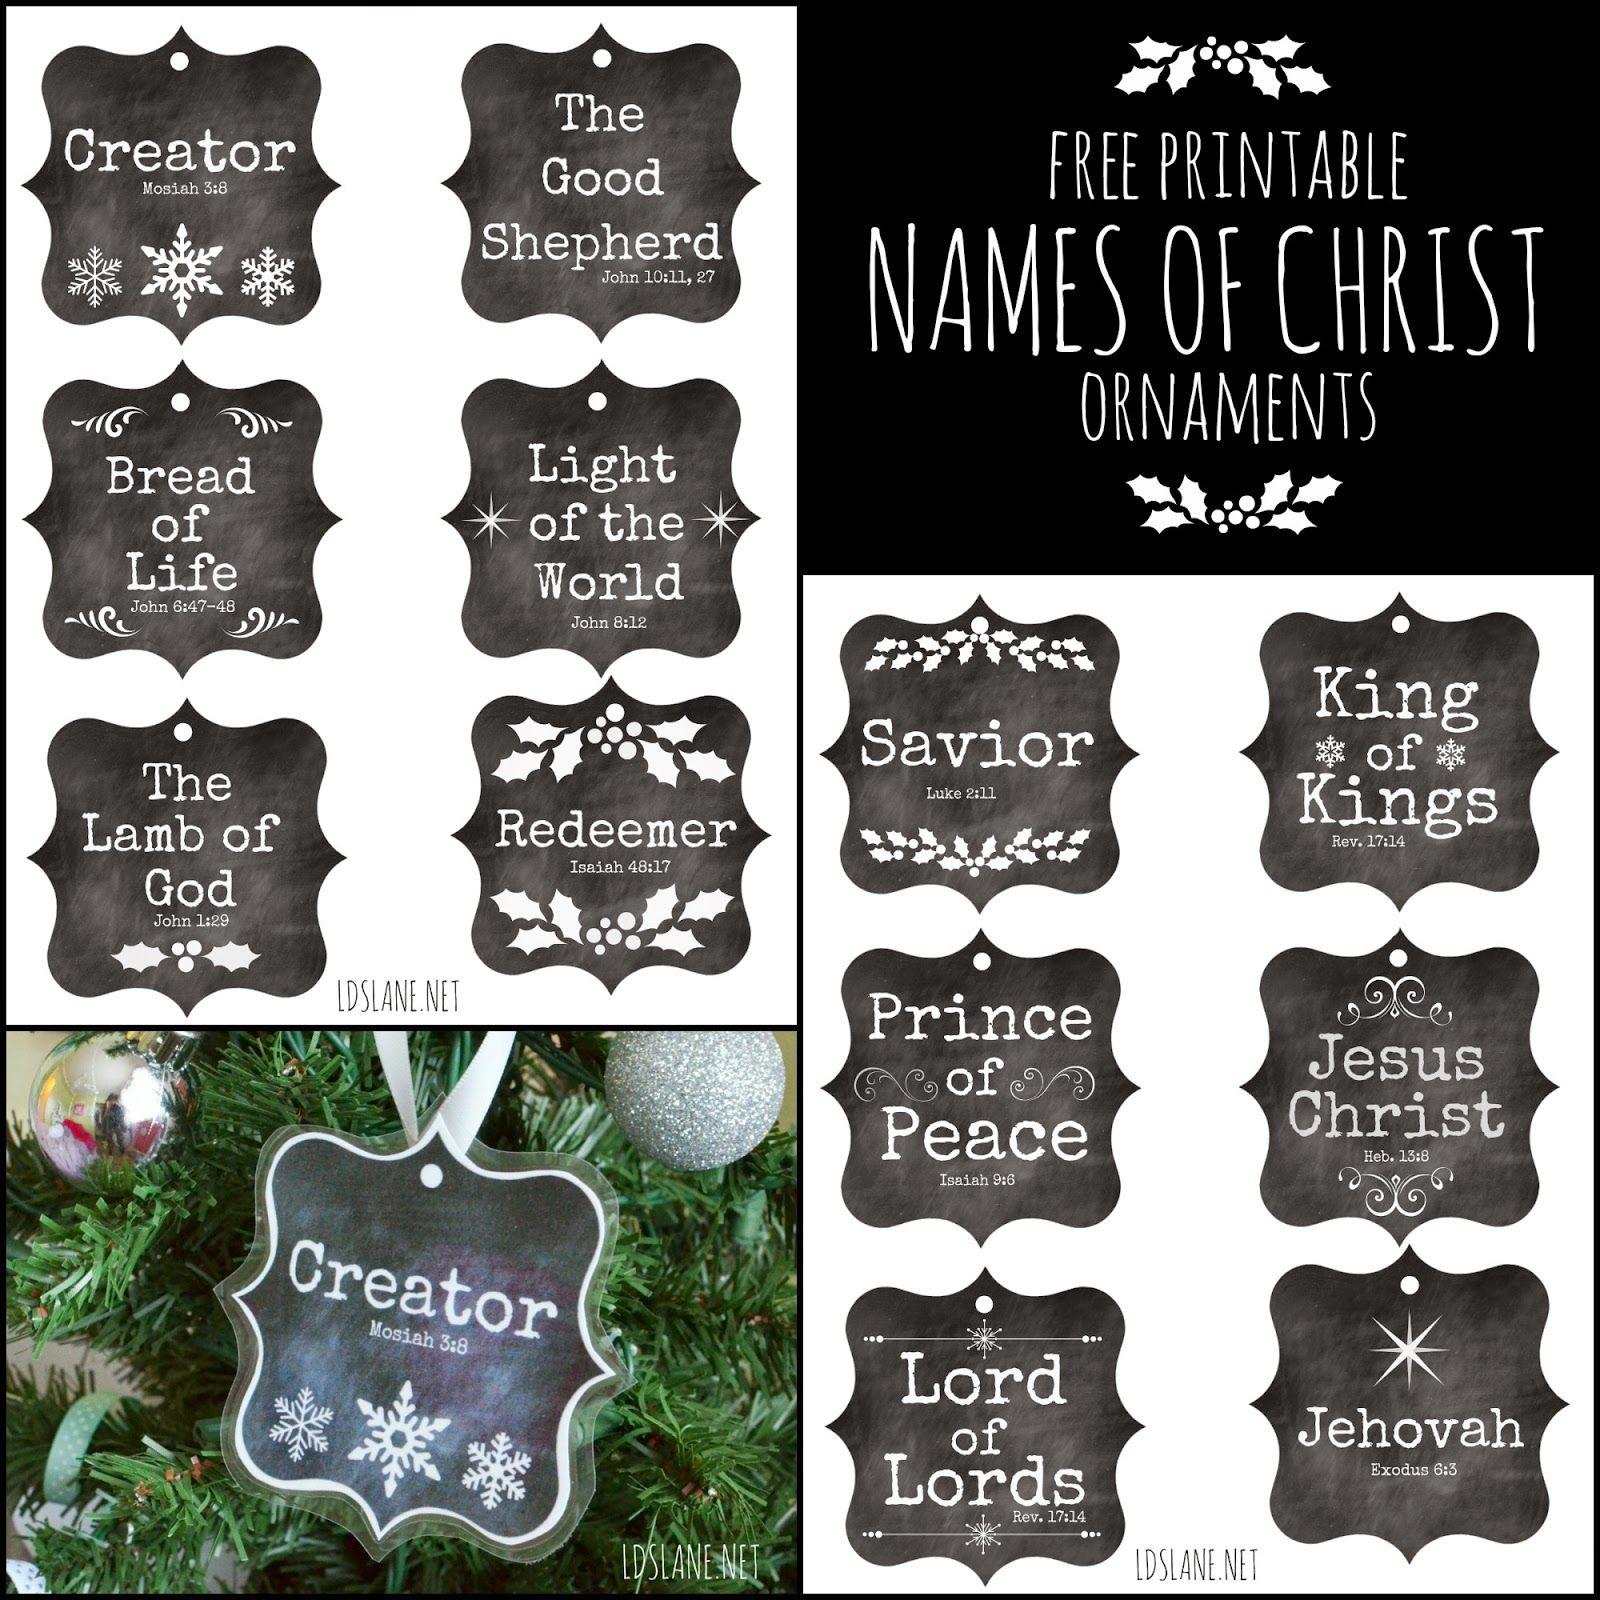 Names of Christ free printable ornaments